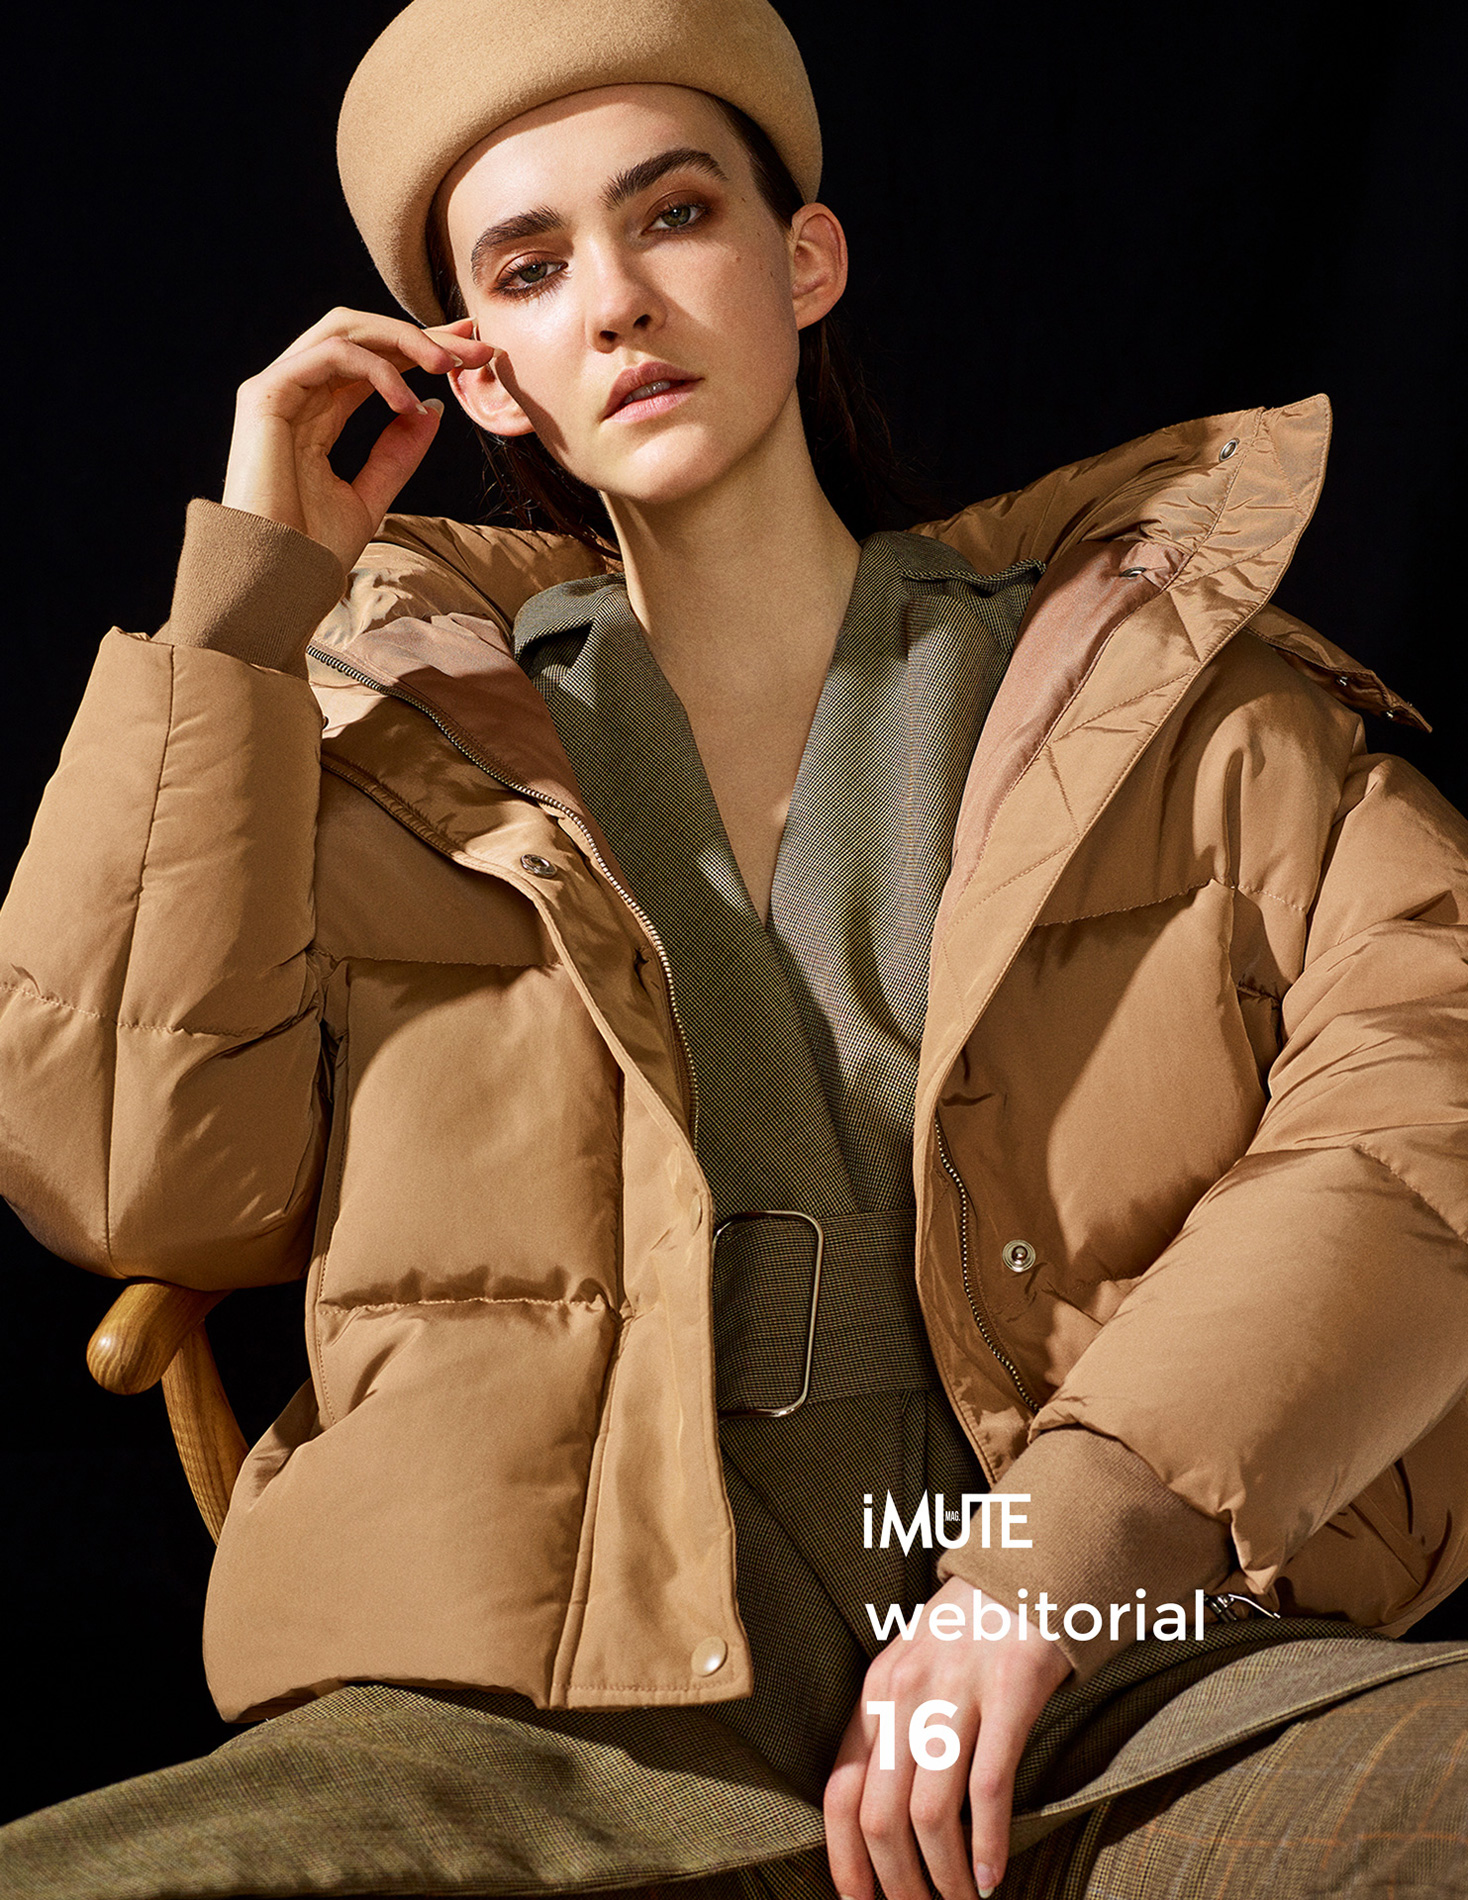 AFTER DARK webitorial for iMute Magazine Photographer|Ellyse Anderson Model| Margarita K @Lizbell Agency Stylist|Leila Bani Makeup|Jon Hennessey Hair|Christopher Deagle